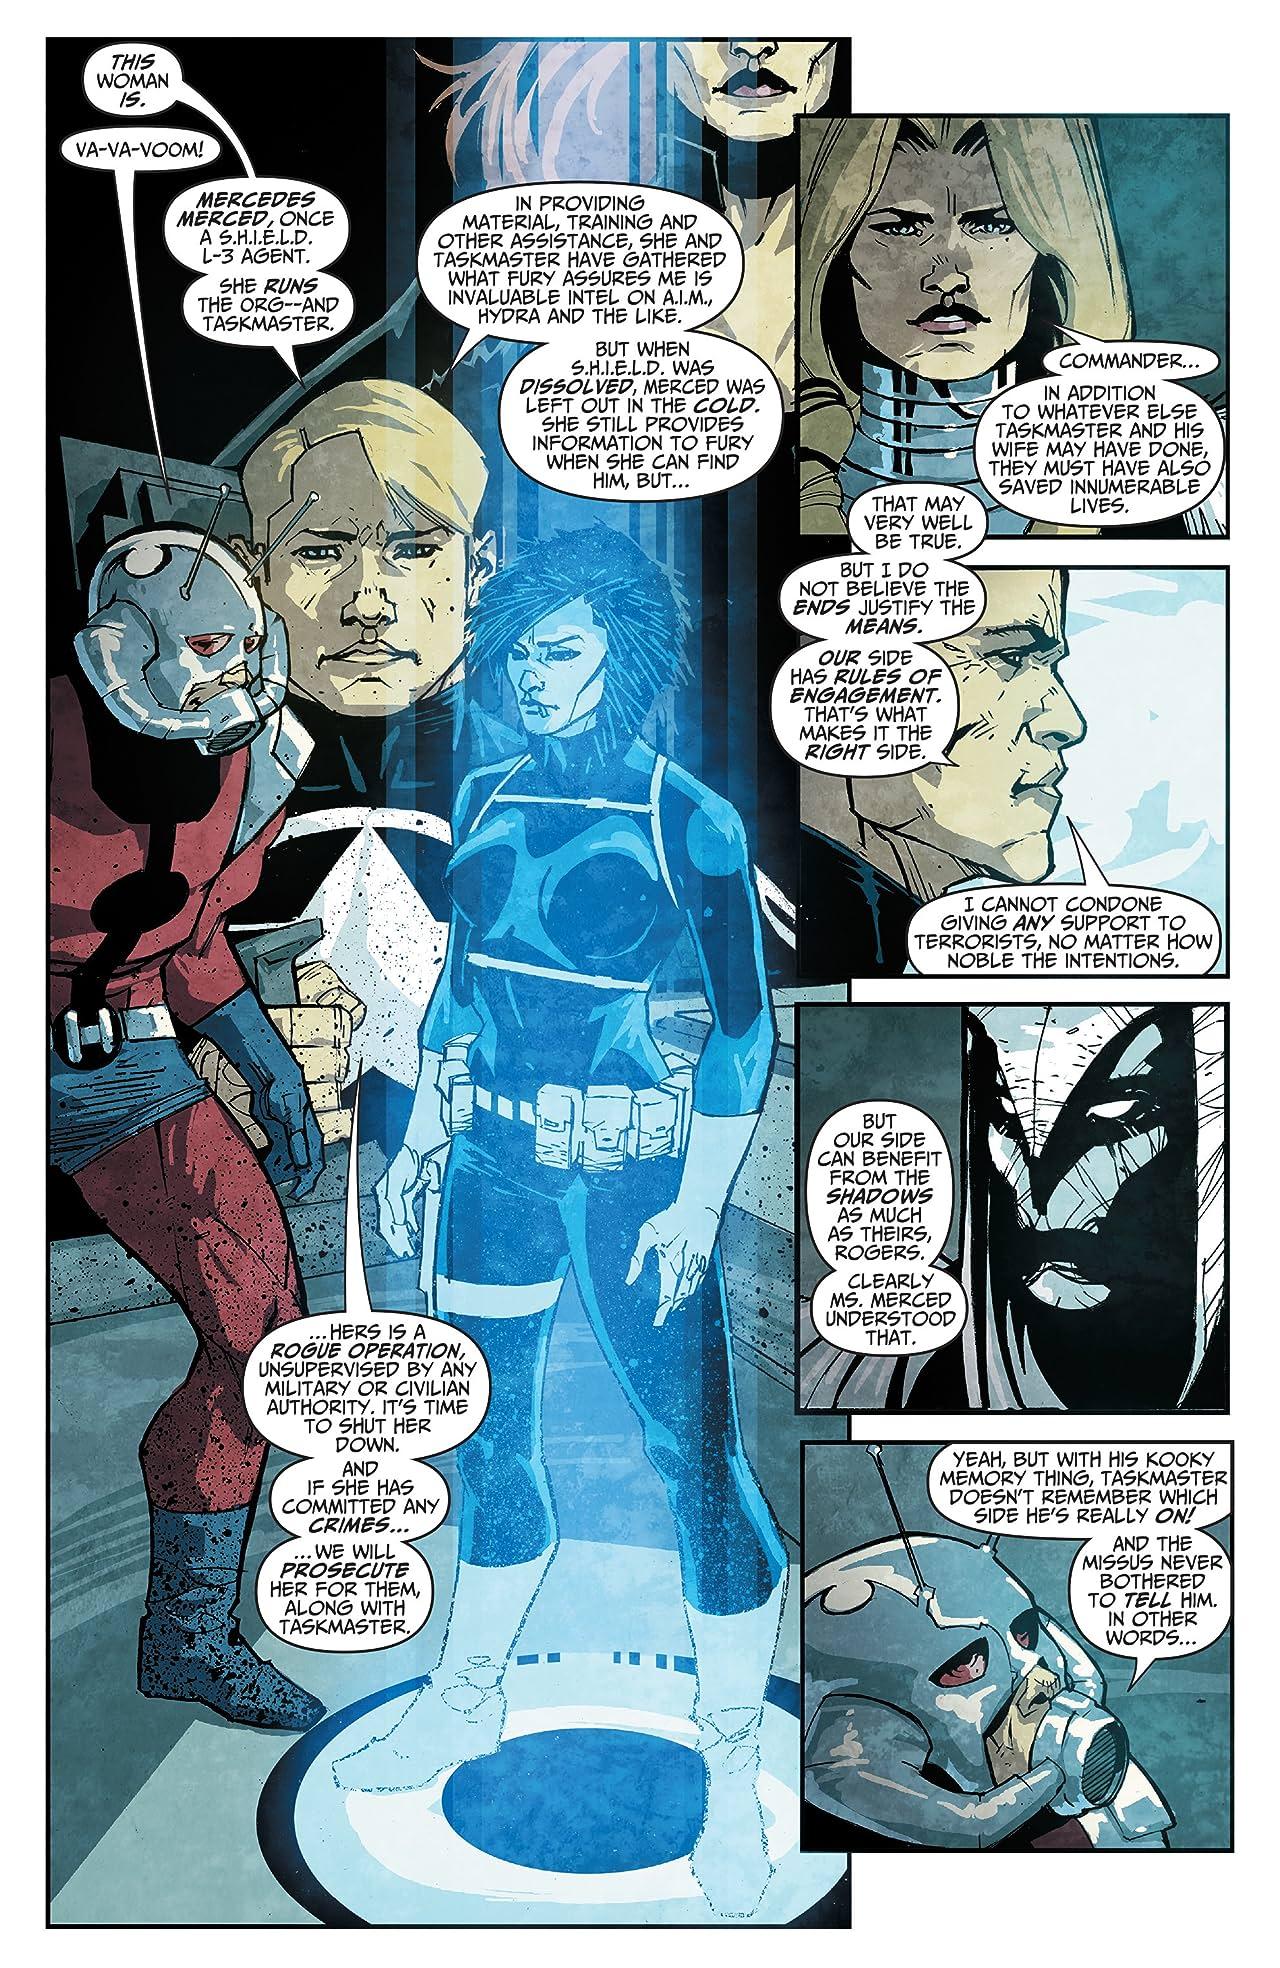 Taskmaster (2010) #4 (of 4)